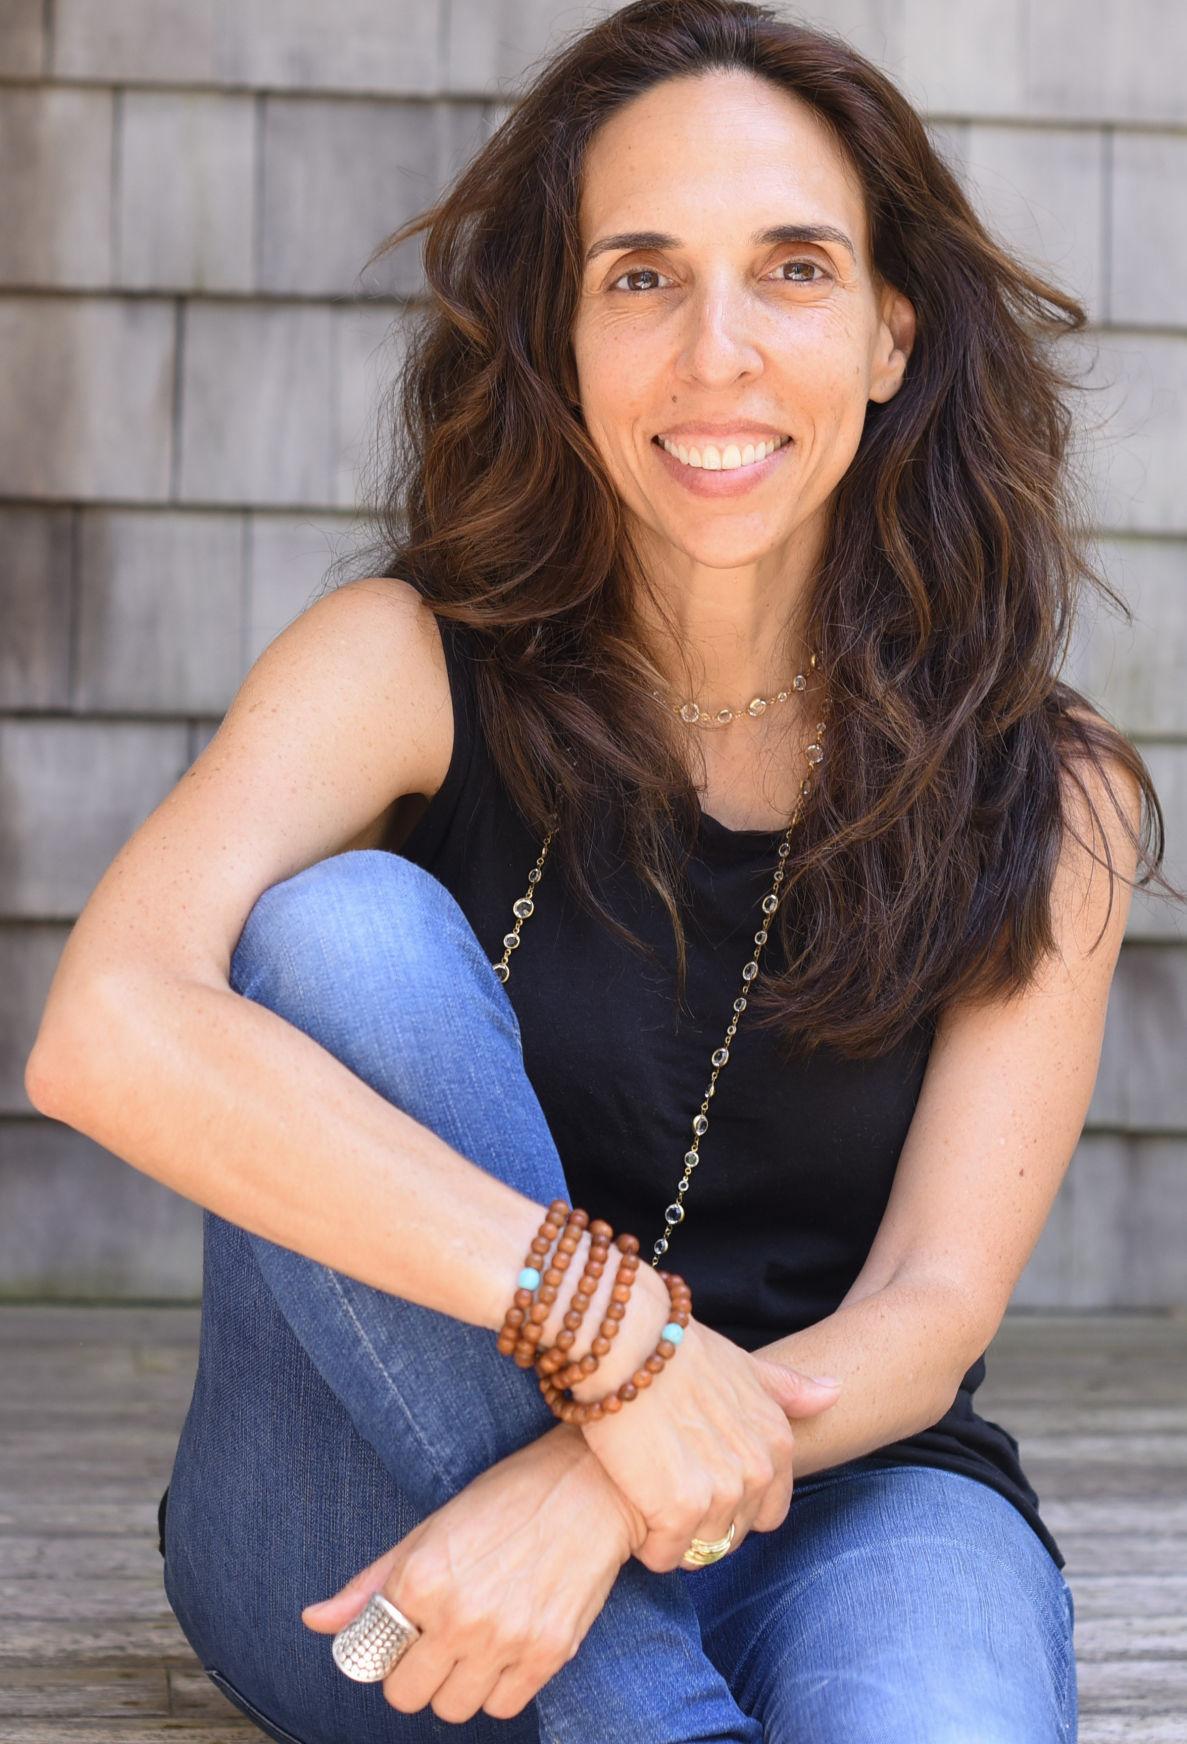 Children's author Susan Verde